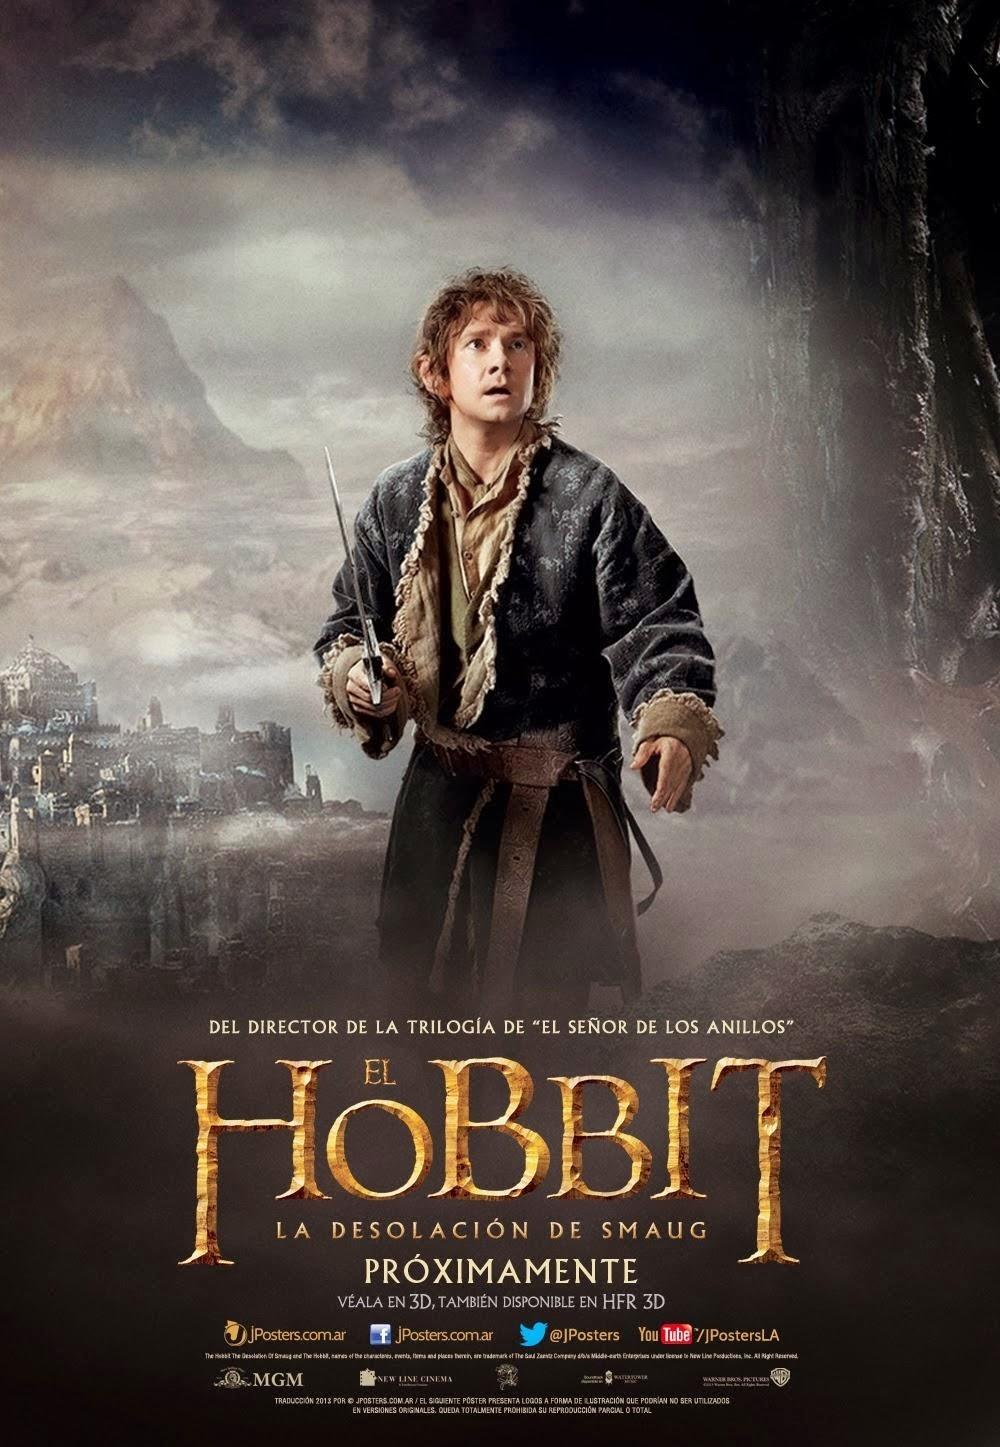 the hobbit (2013) the desolation of smaug subtitle indonesia | camp